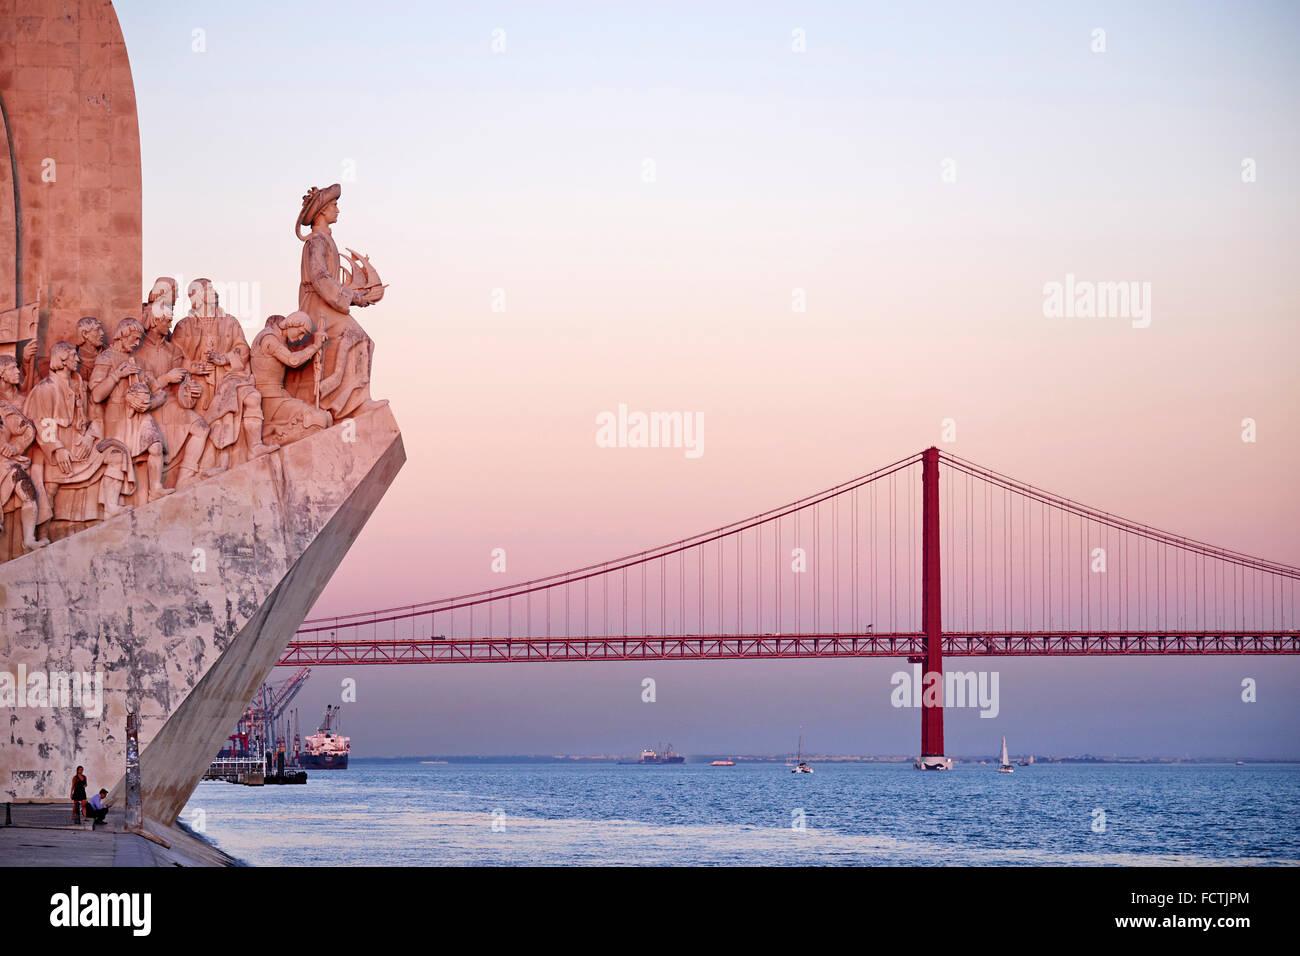 Portugal, Lisbon, Belem, Padrao dos Descobrimentos (Monument to the Discoveries - Stock Image